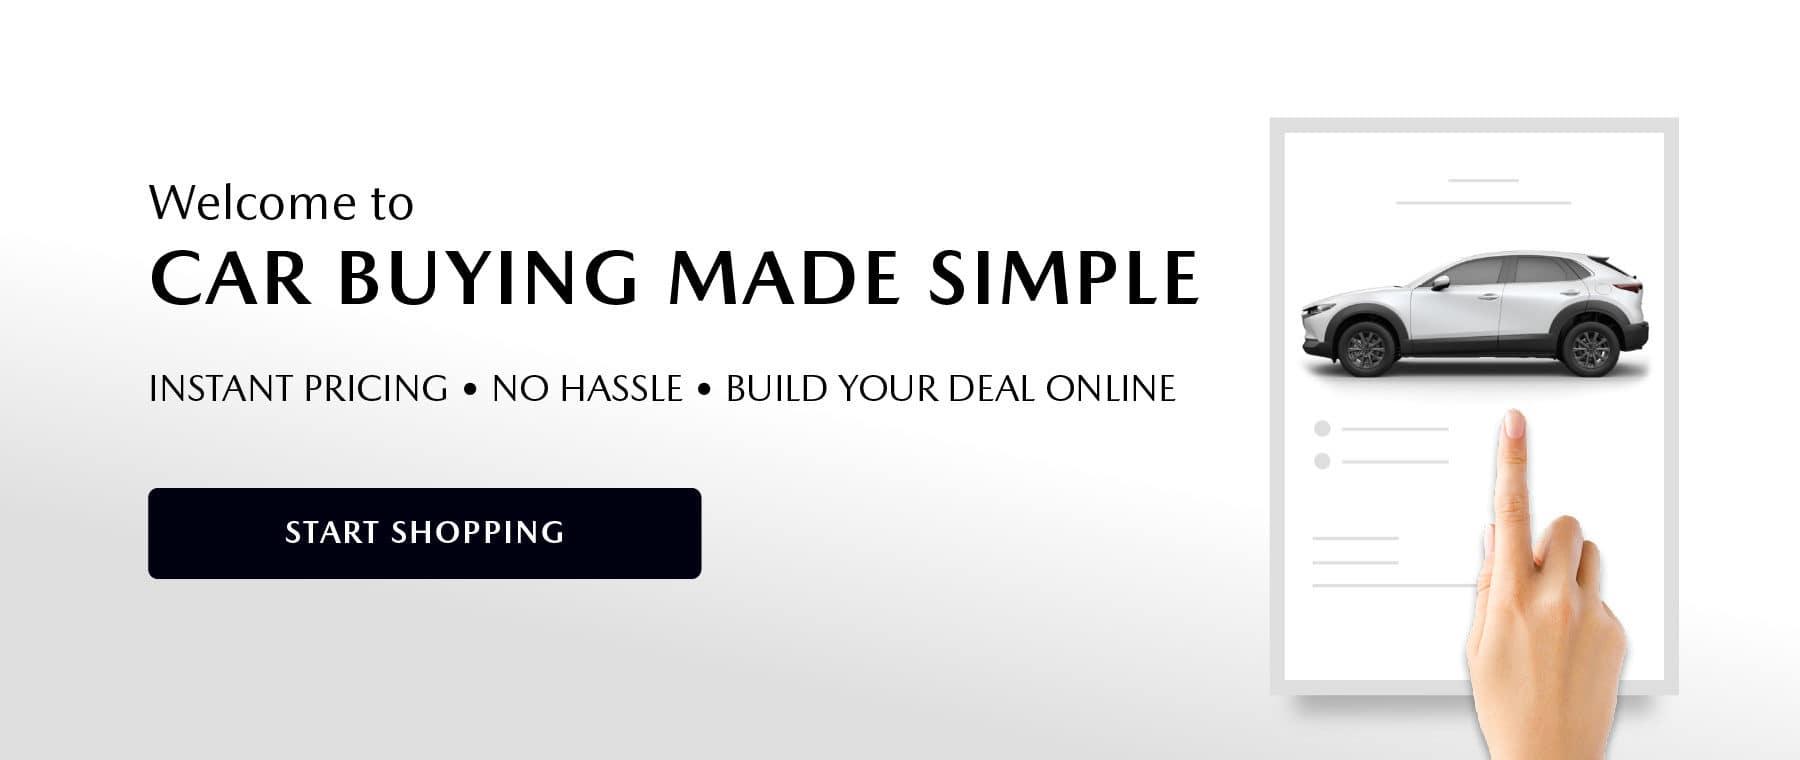 Online-Store-80